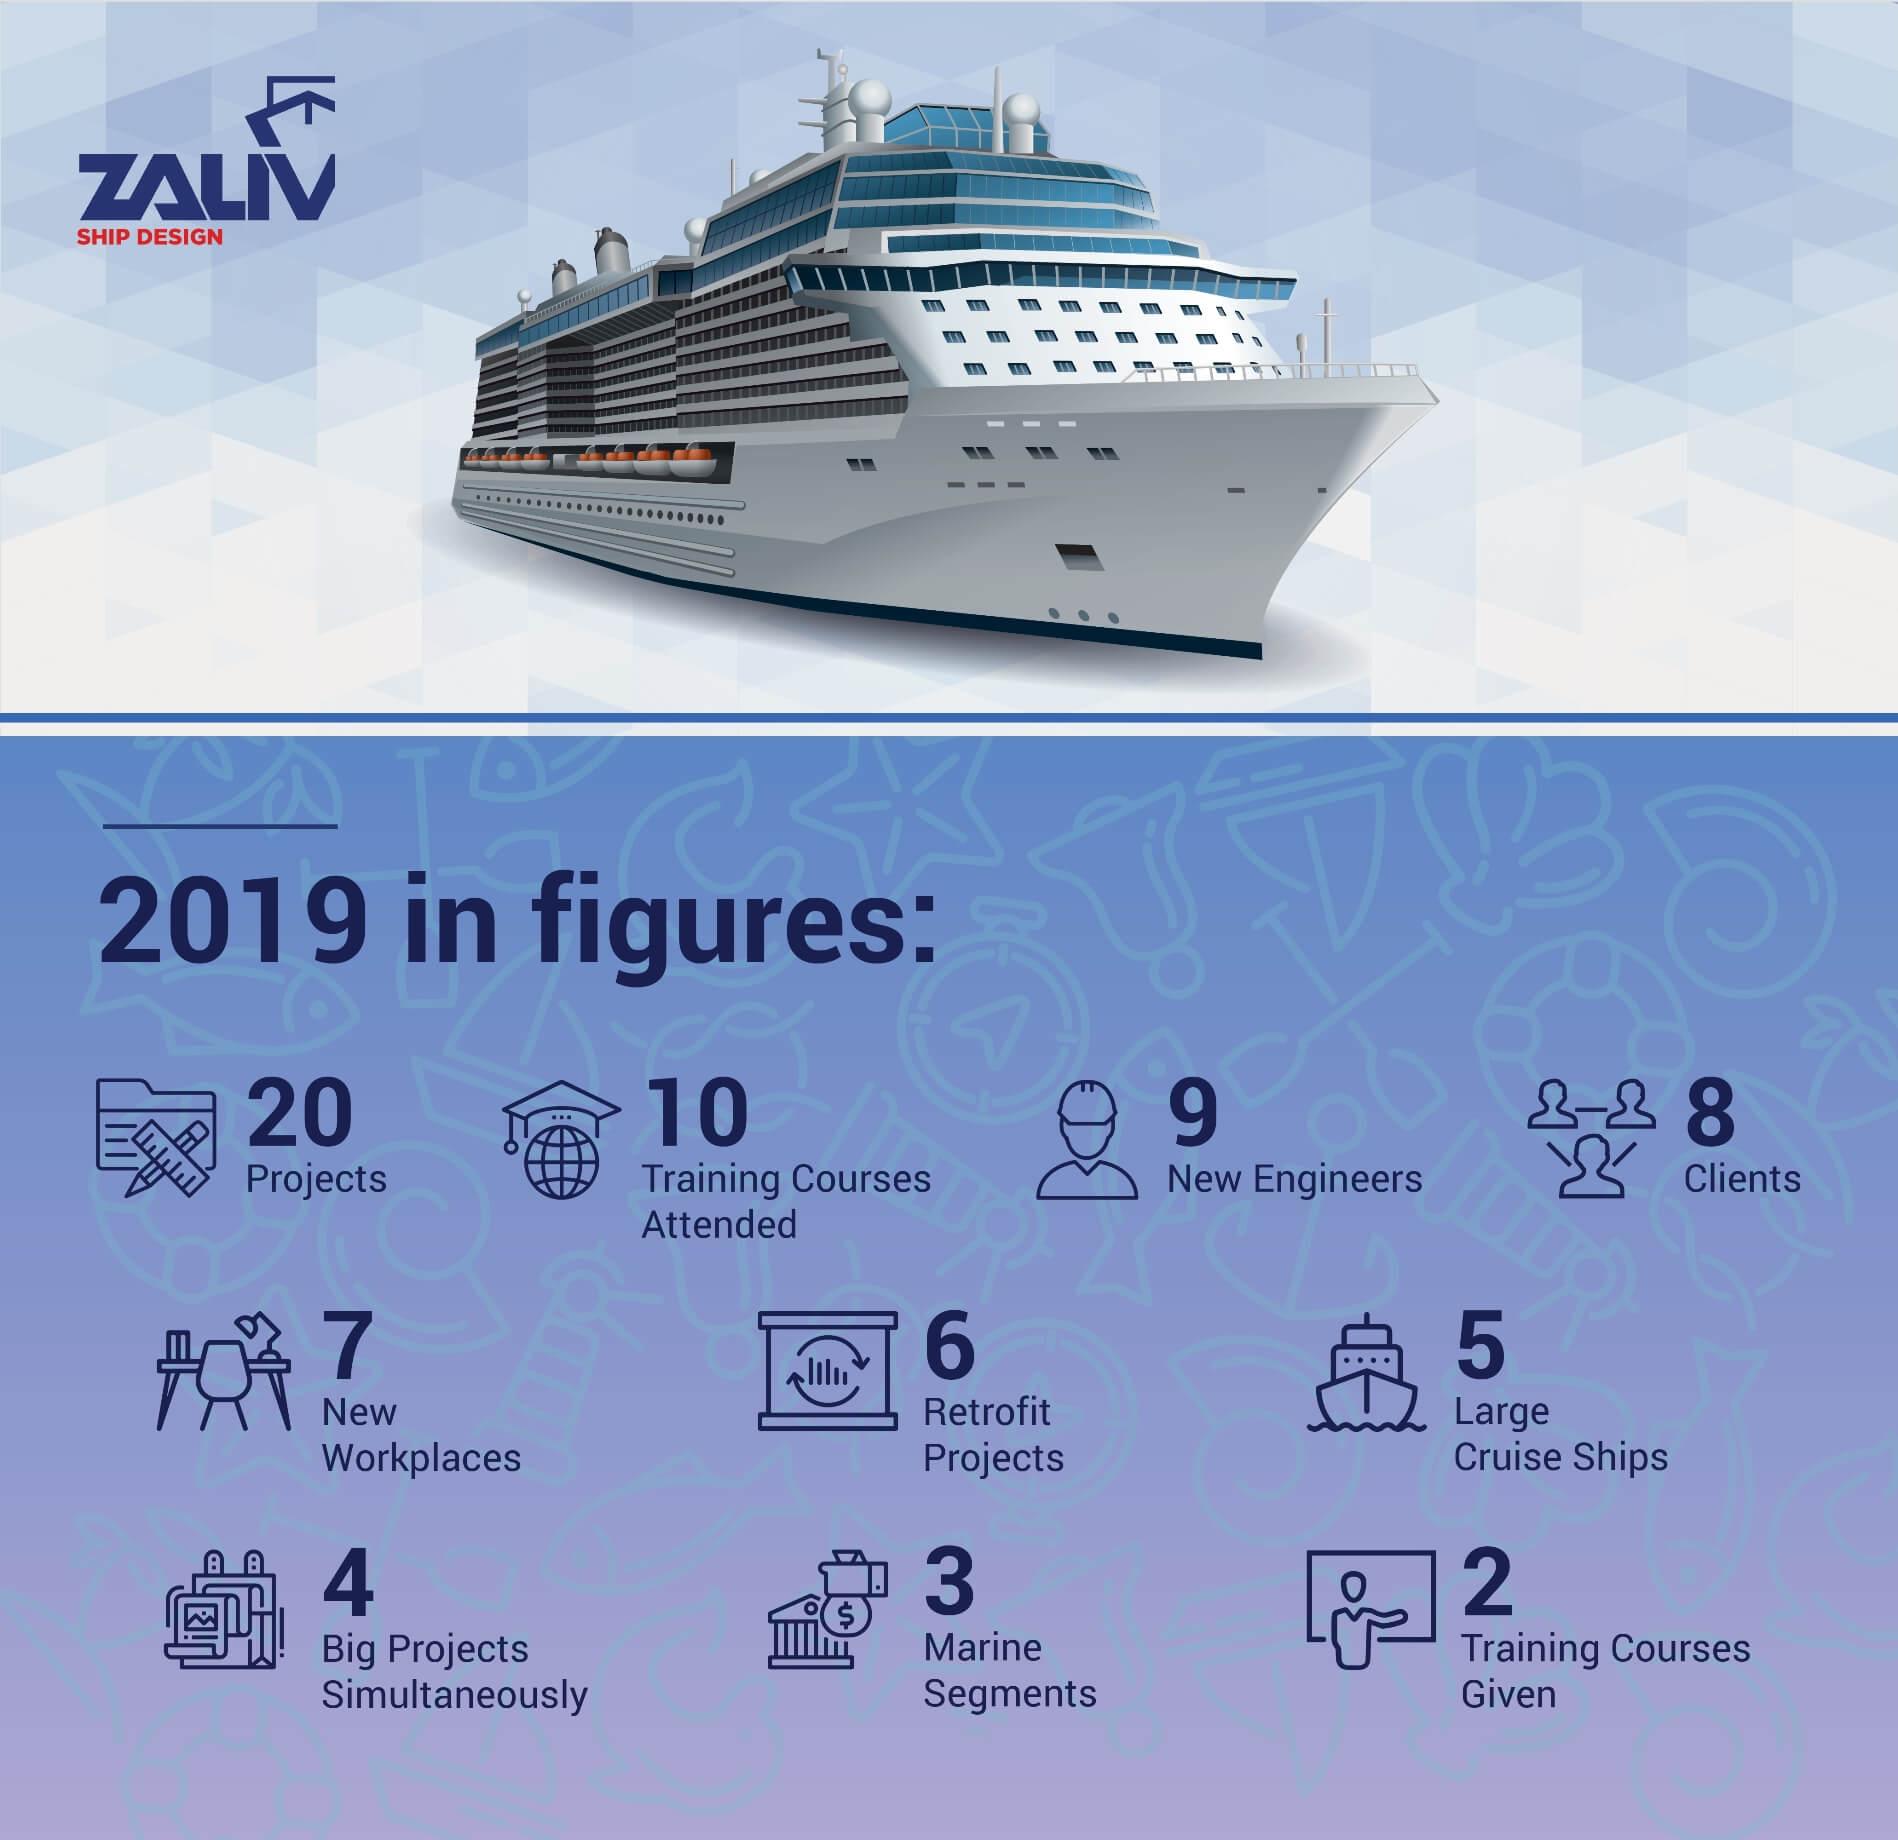 Zaliv Ship Design 2019 Project figures